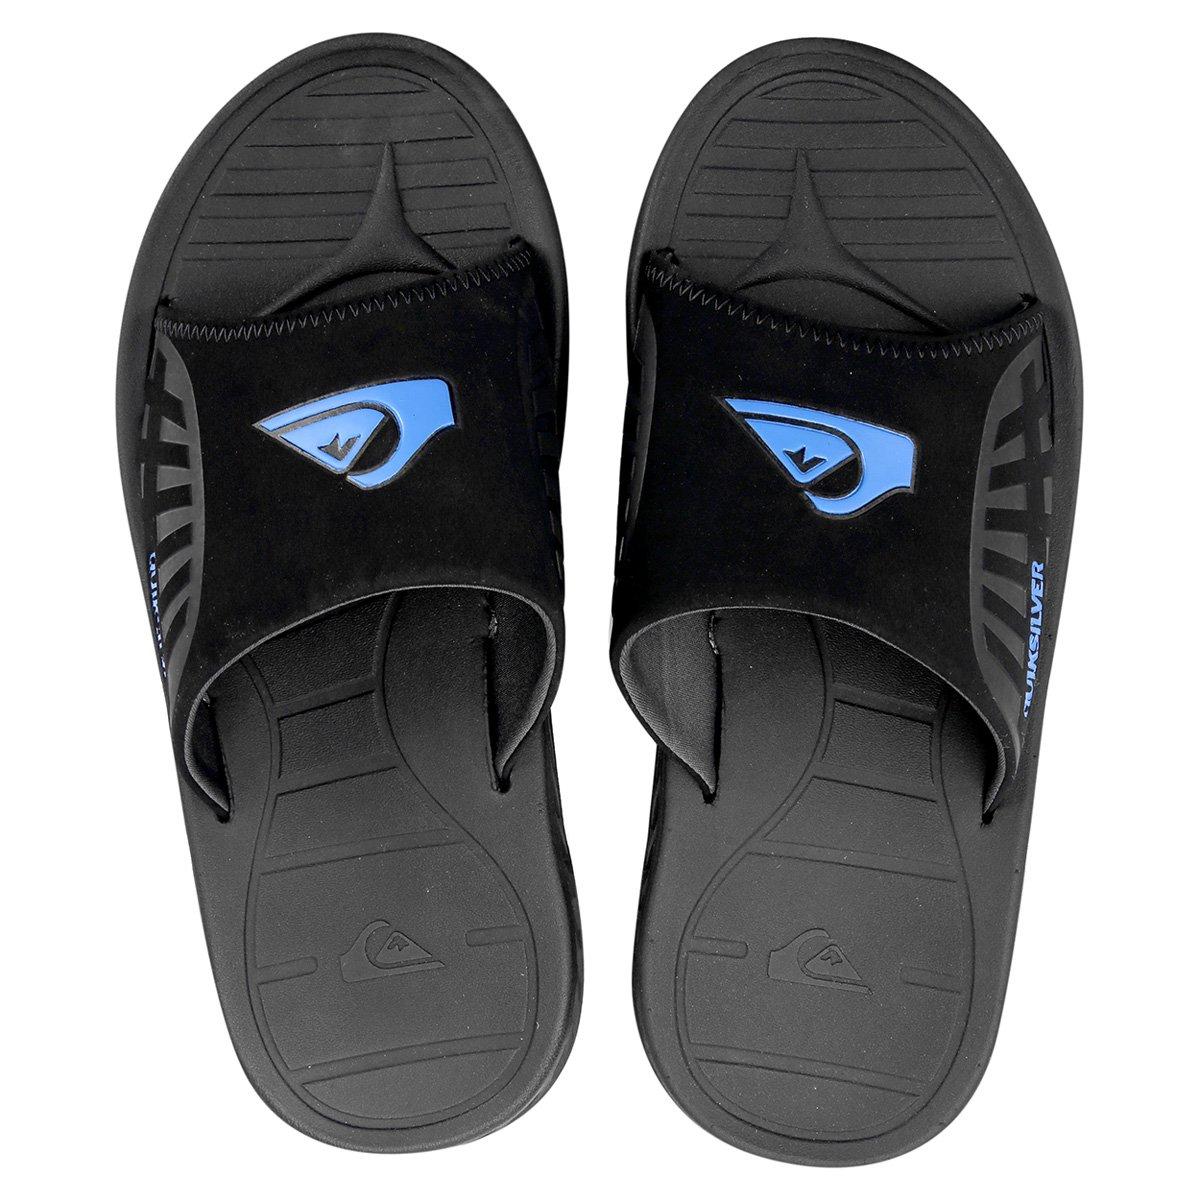 1af01d36a4207 Chinelo Quiksilver Triton Slide - Compre Agora